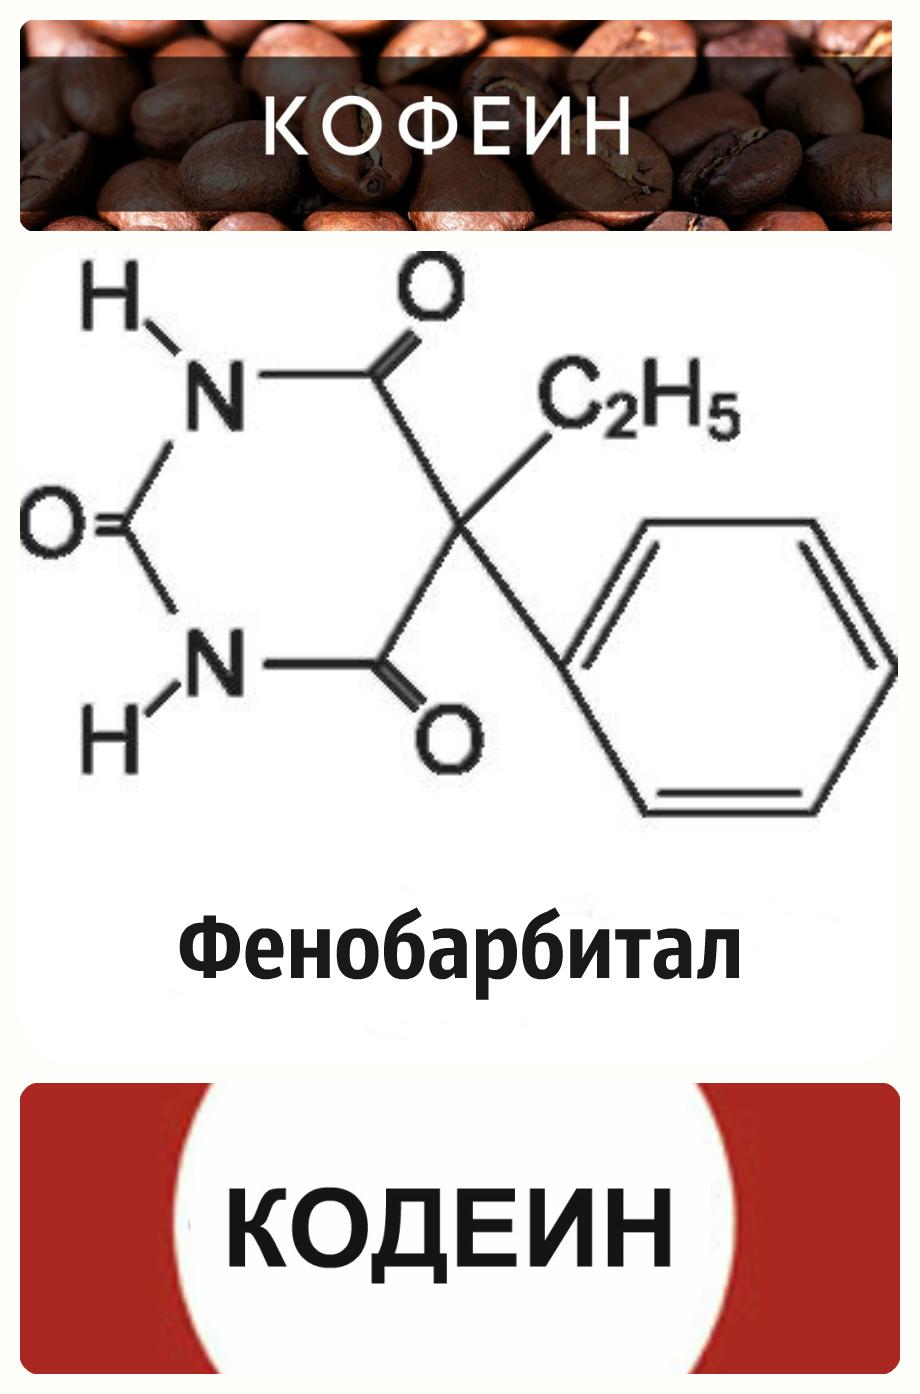 таблетки от мигрени - типы веществ